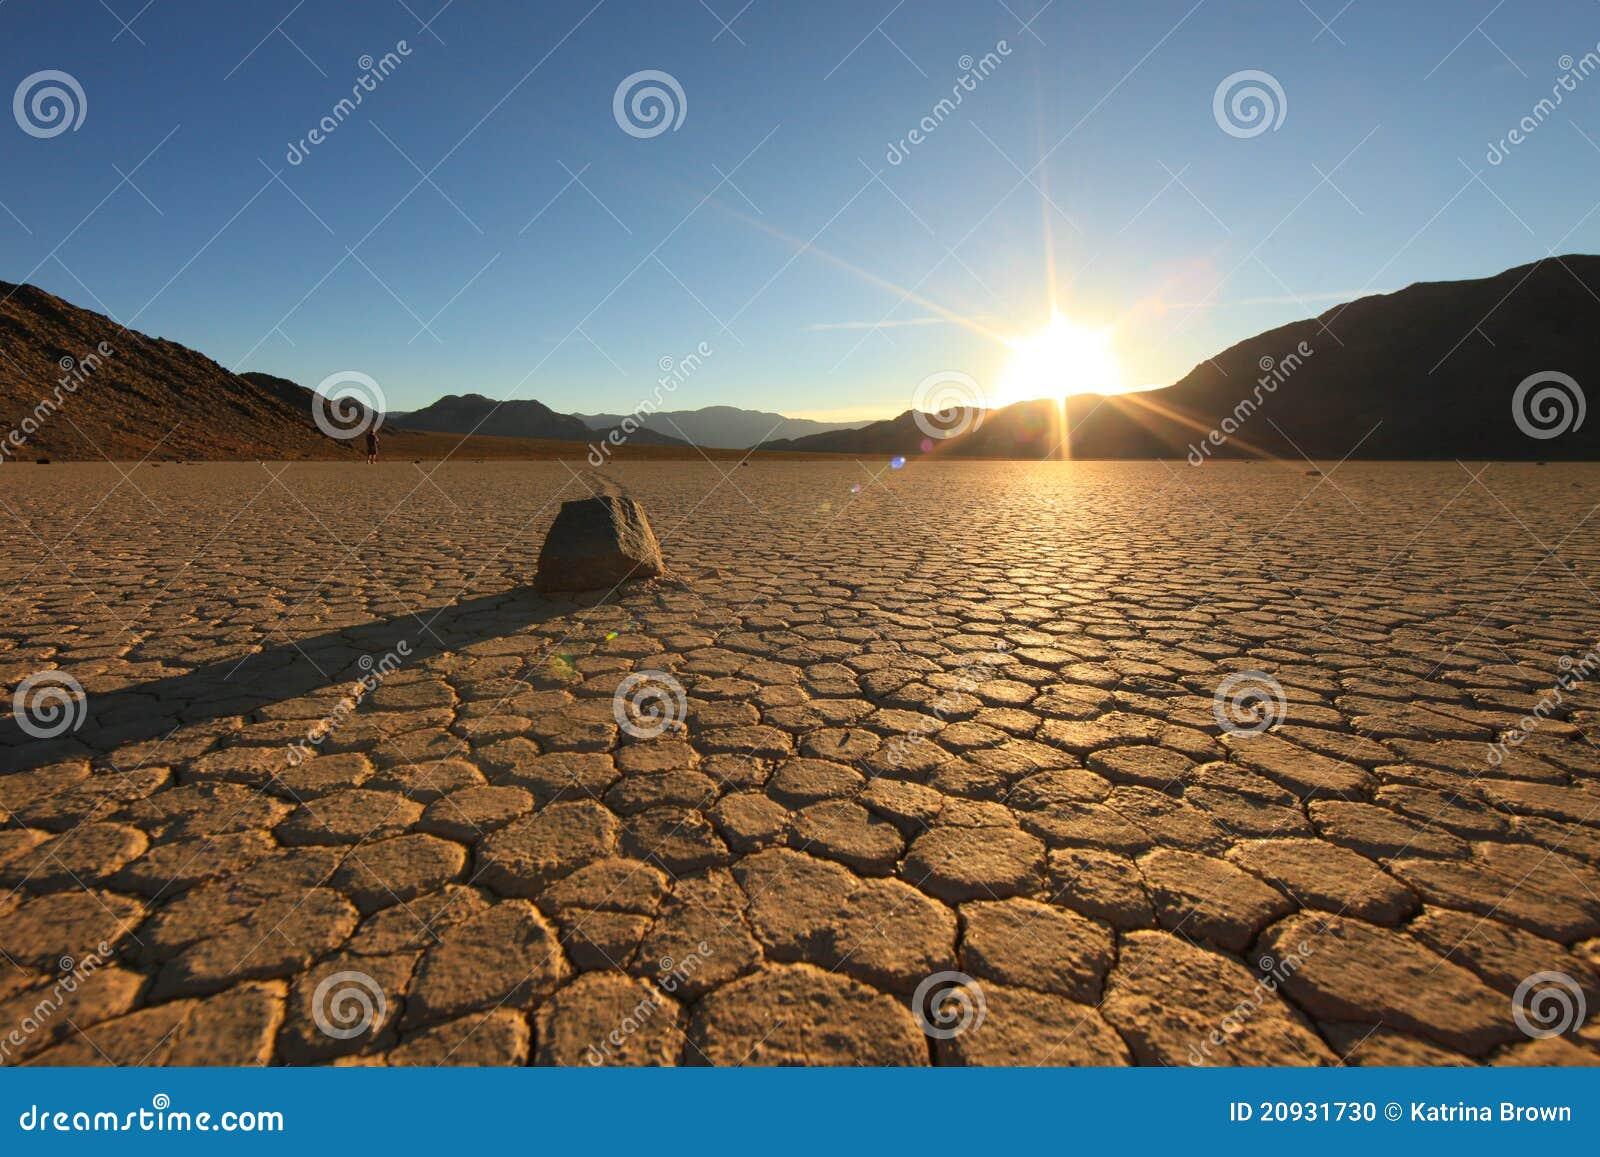 Landscape in Death Valley National Park, Cal